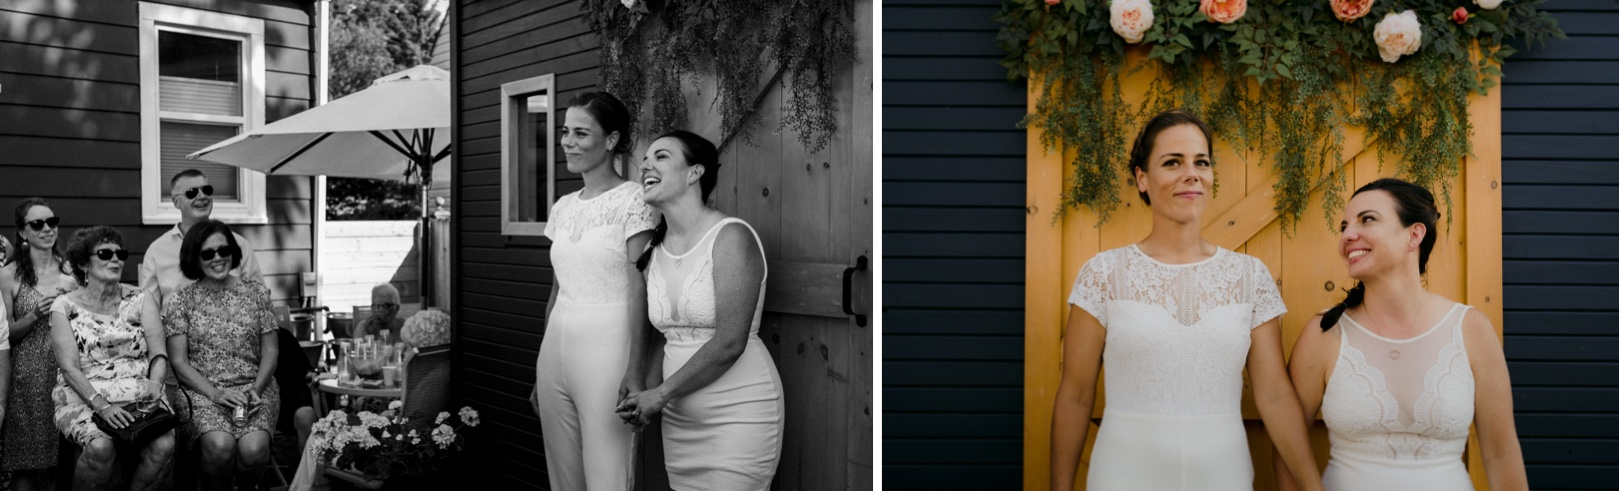 27_KAARA STACY-475_KAARA STACY-536_Events_Engagement_2018_Travel_Weddings_Photography_best_Portraits.jpg